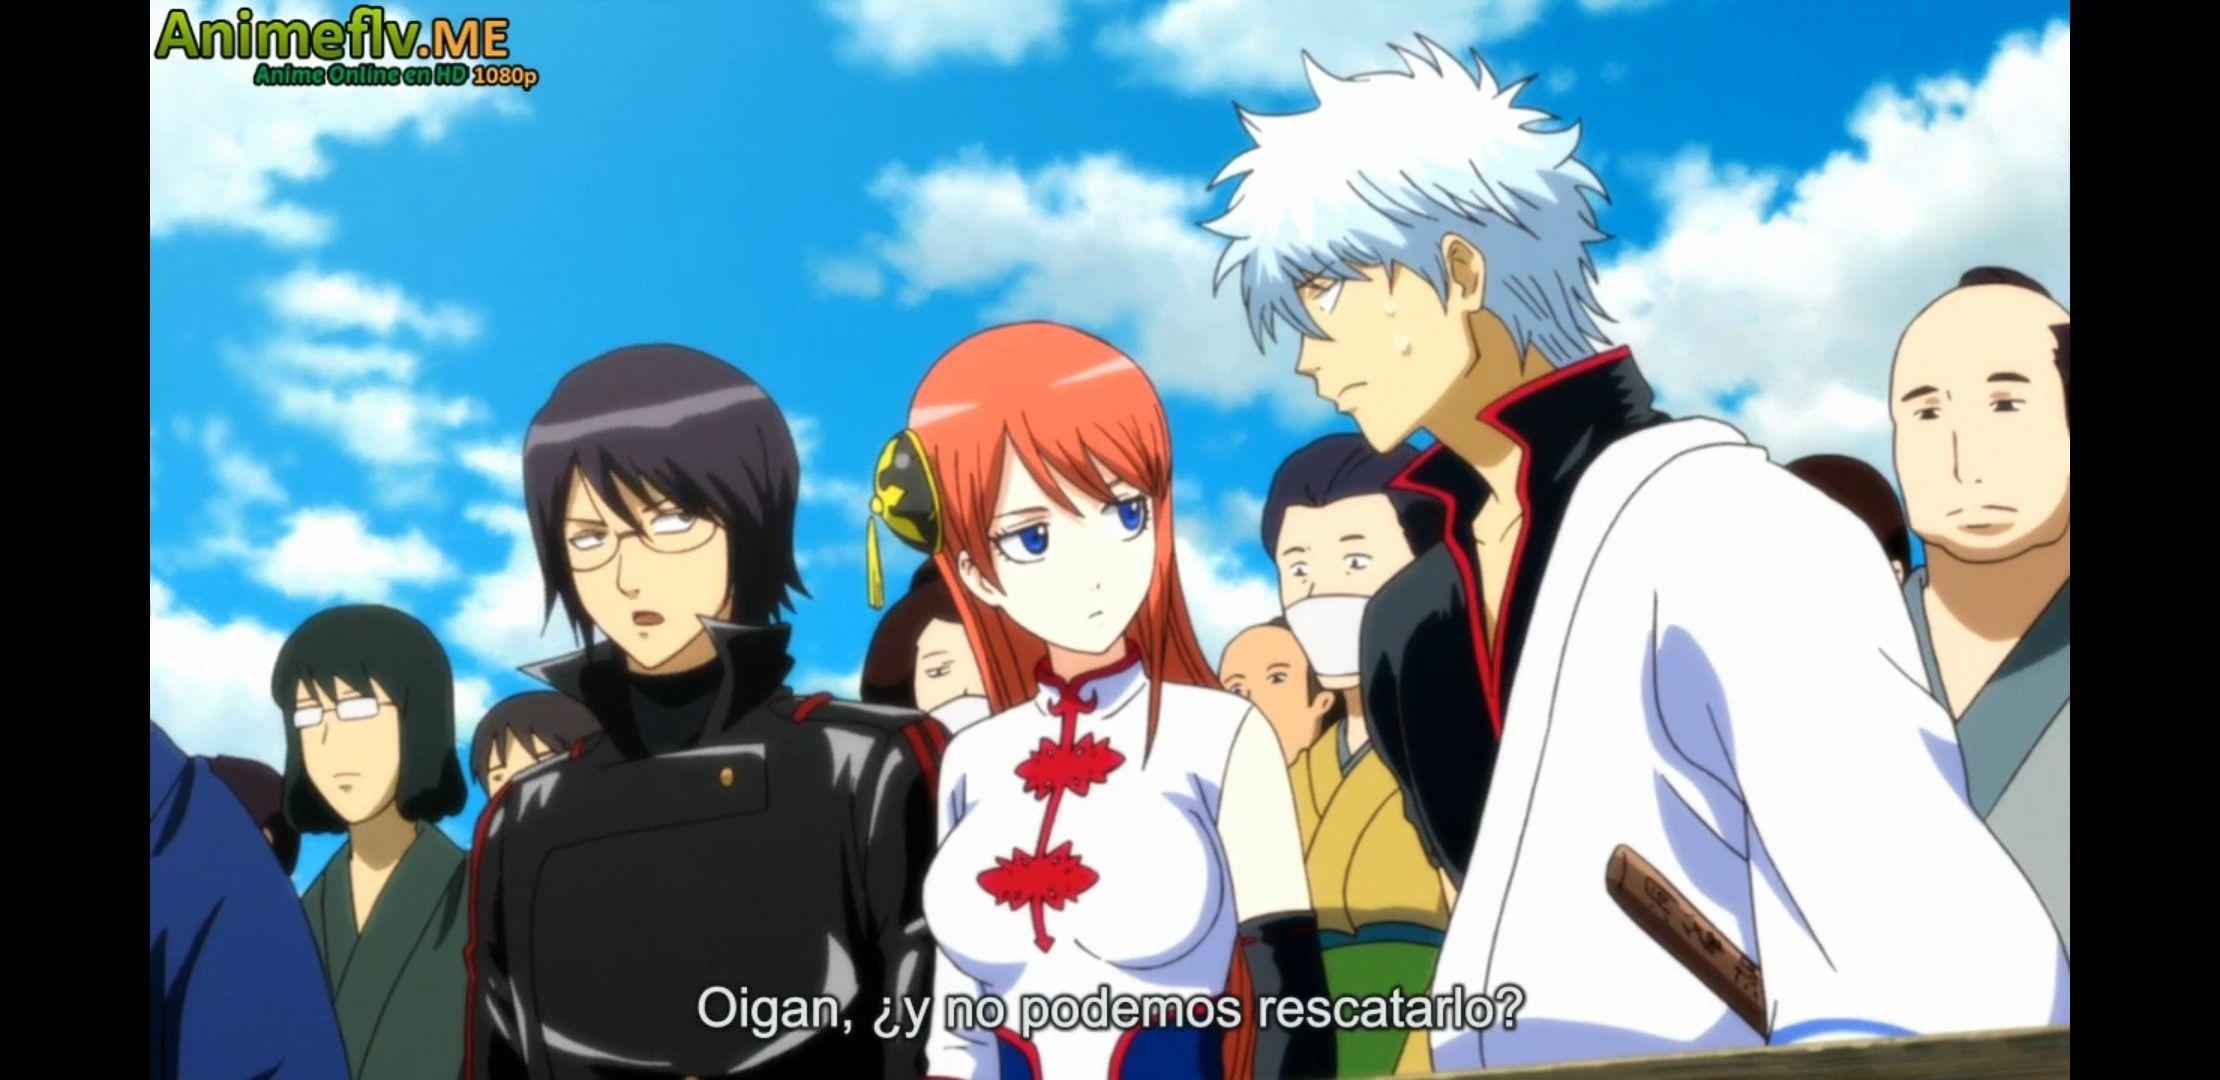 pin by fatzlovesrizi on gintama kagura anime art